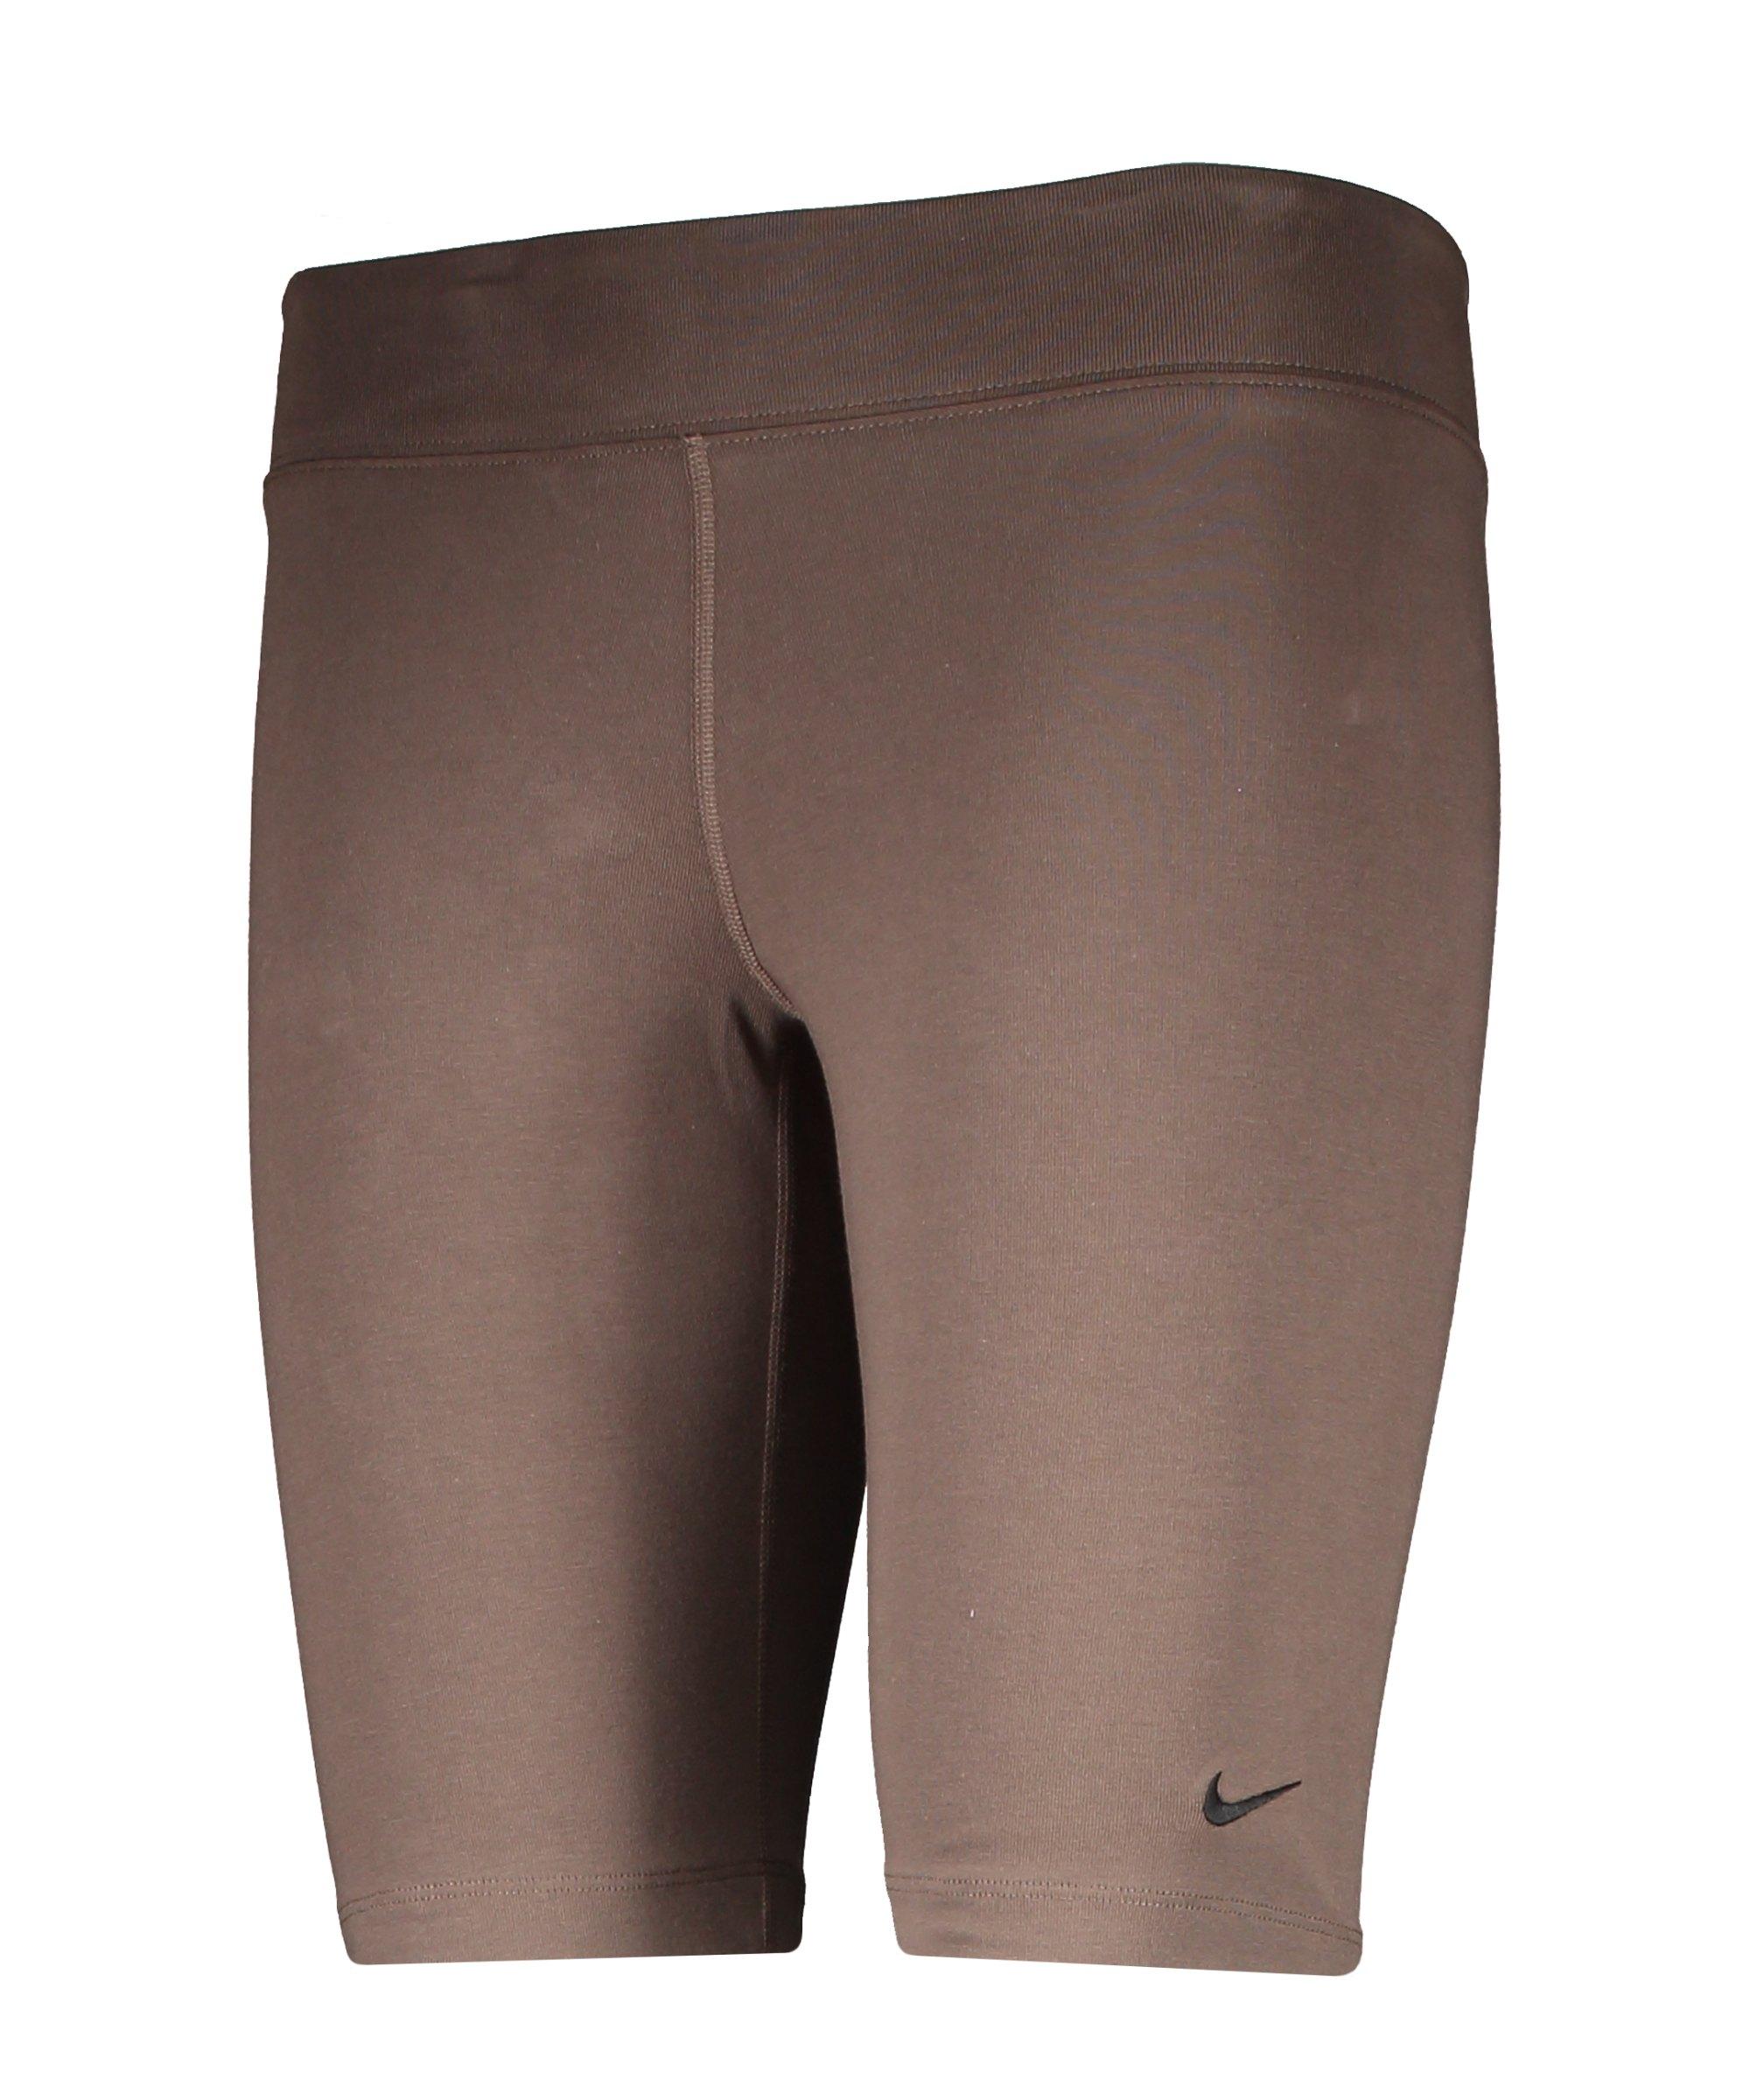 Nike Essentials Bike Short Damen Grau Schwarz F004 - braun